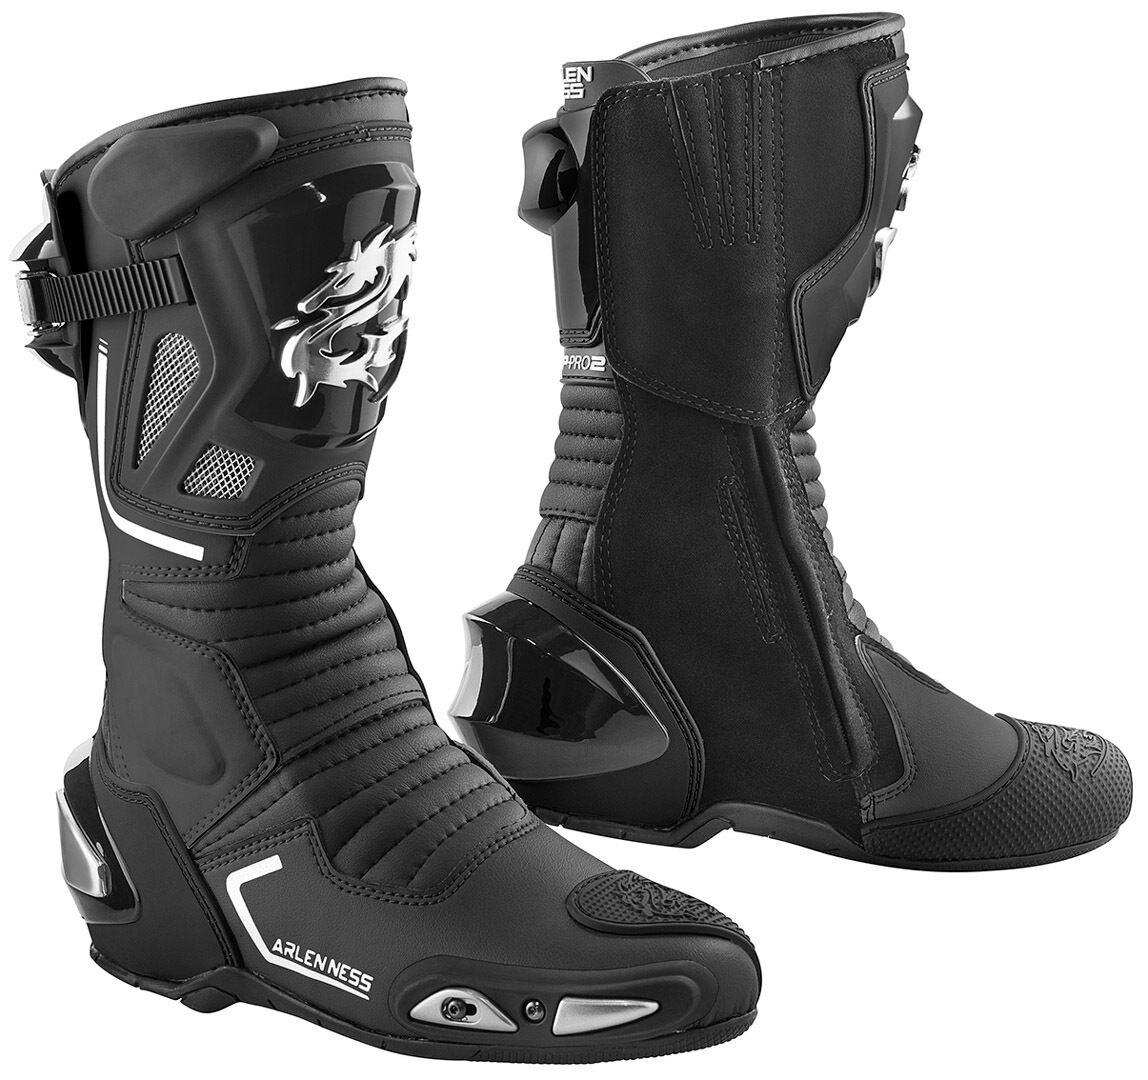 Arlen Ness Sugello Bottes de moto Noir taille : 46